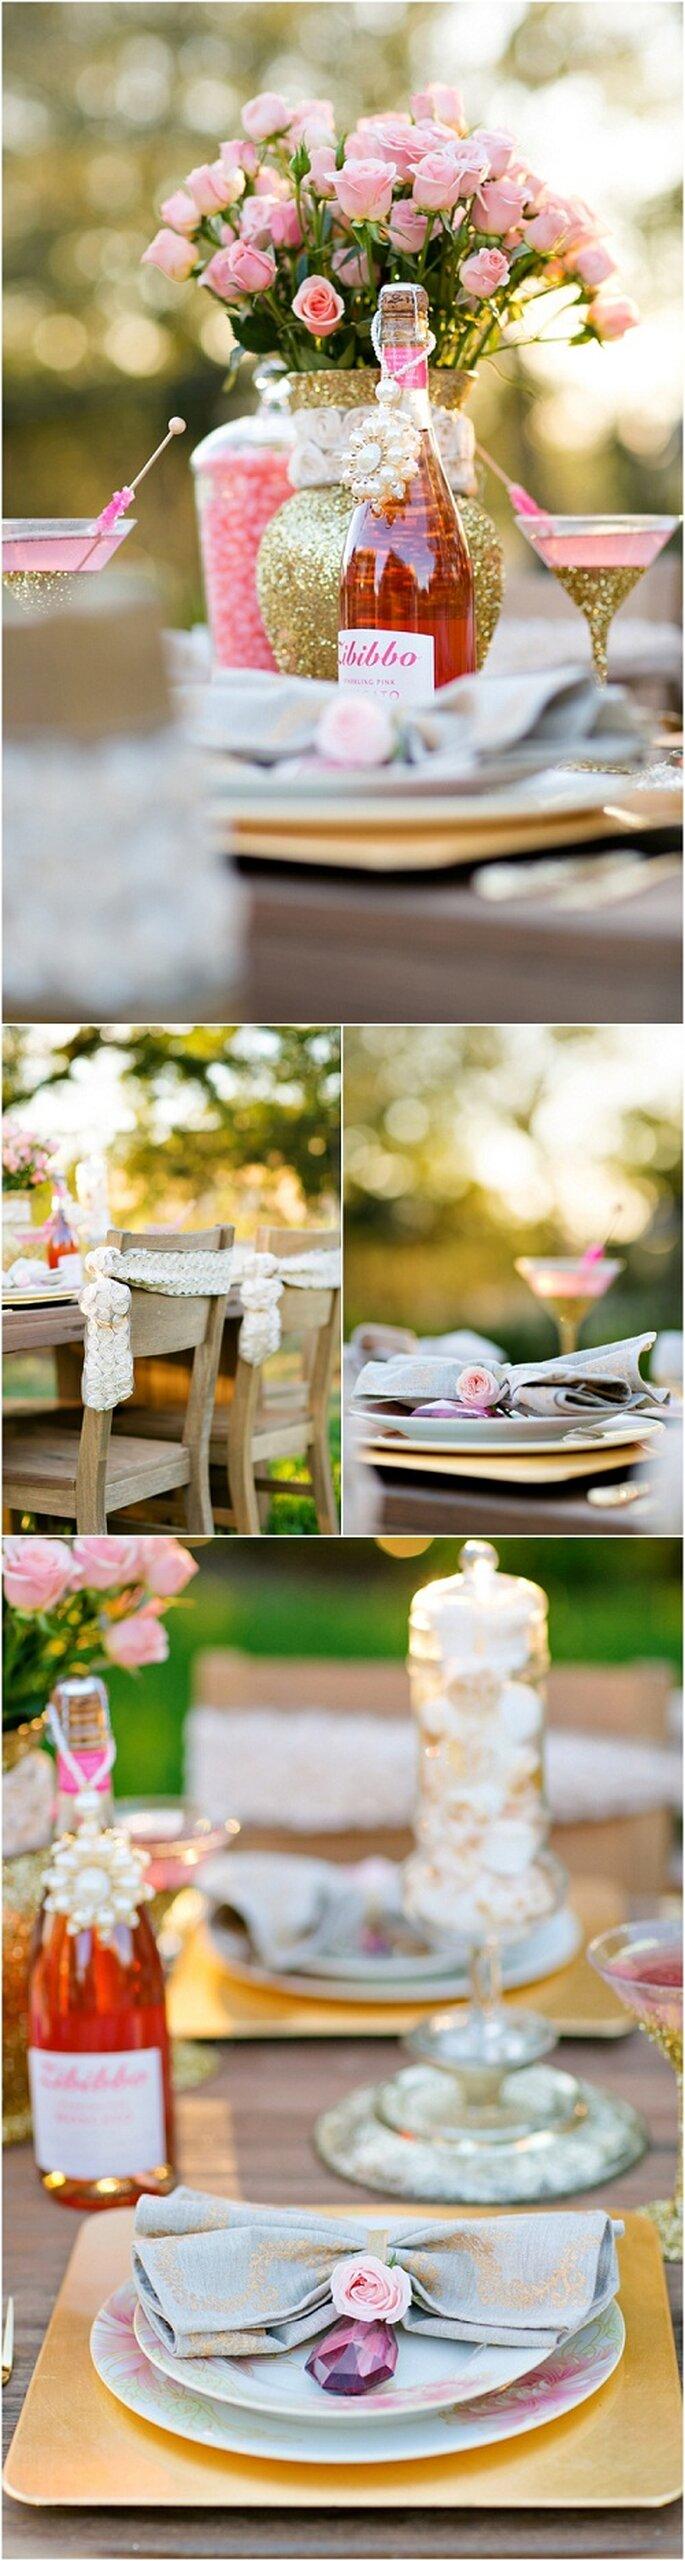 Copas de martini y centros de mesa con detalles dorados - Foto Set Free Photography